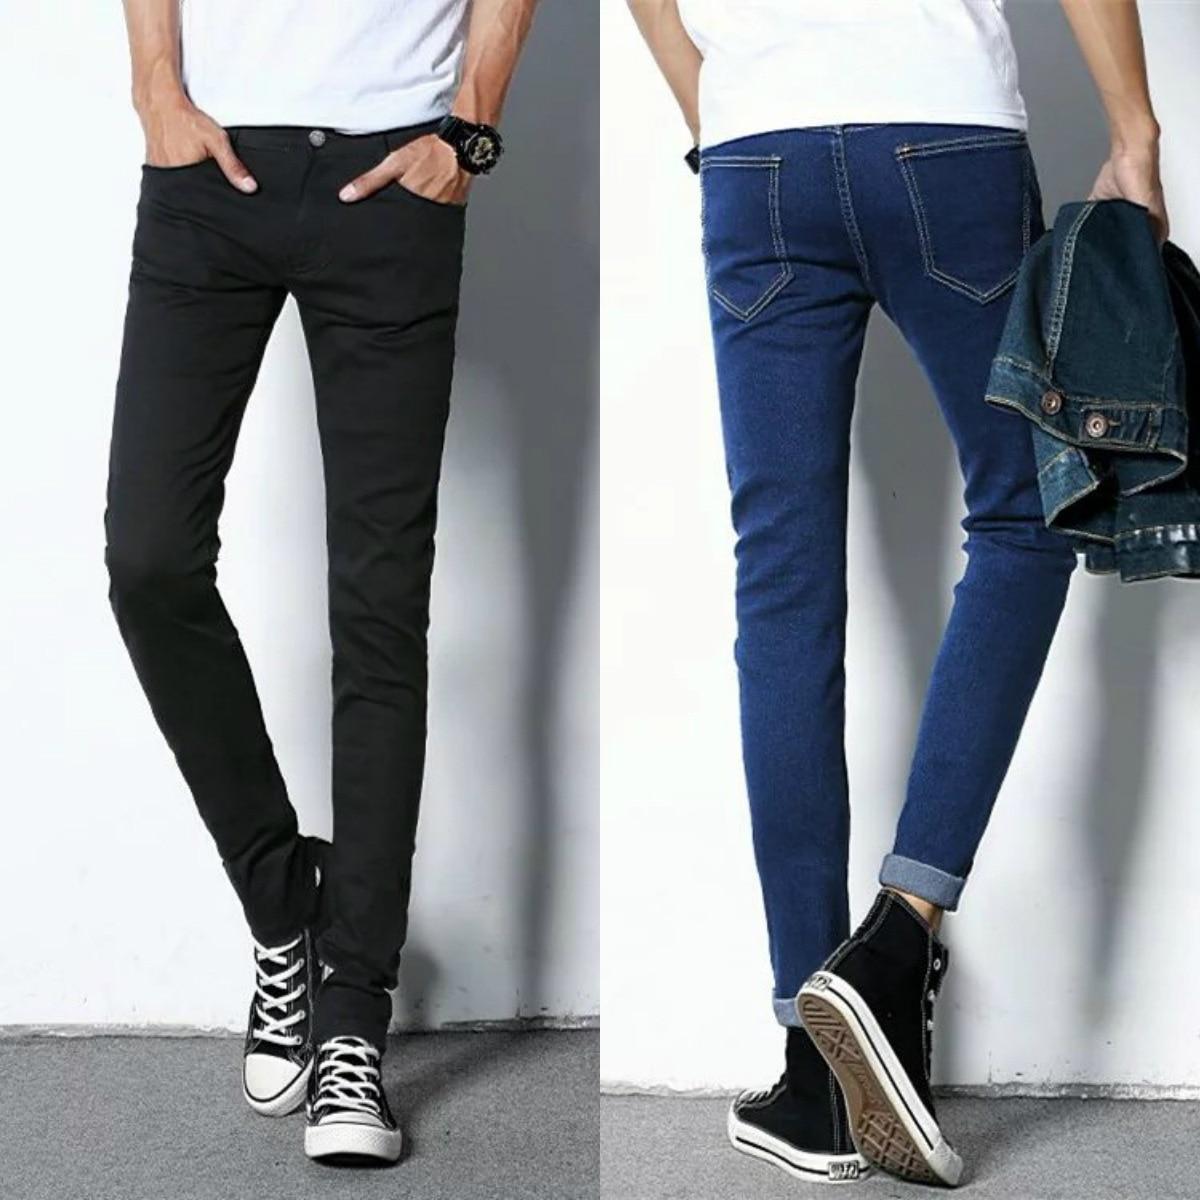 2019 Autumn New Style MEN'S Jeans Hot Selling Slim Fit Pants Men's Trousers Trend Versitile Fashion Korean-style Long Pants